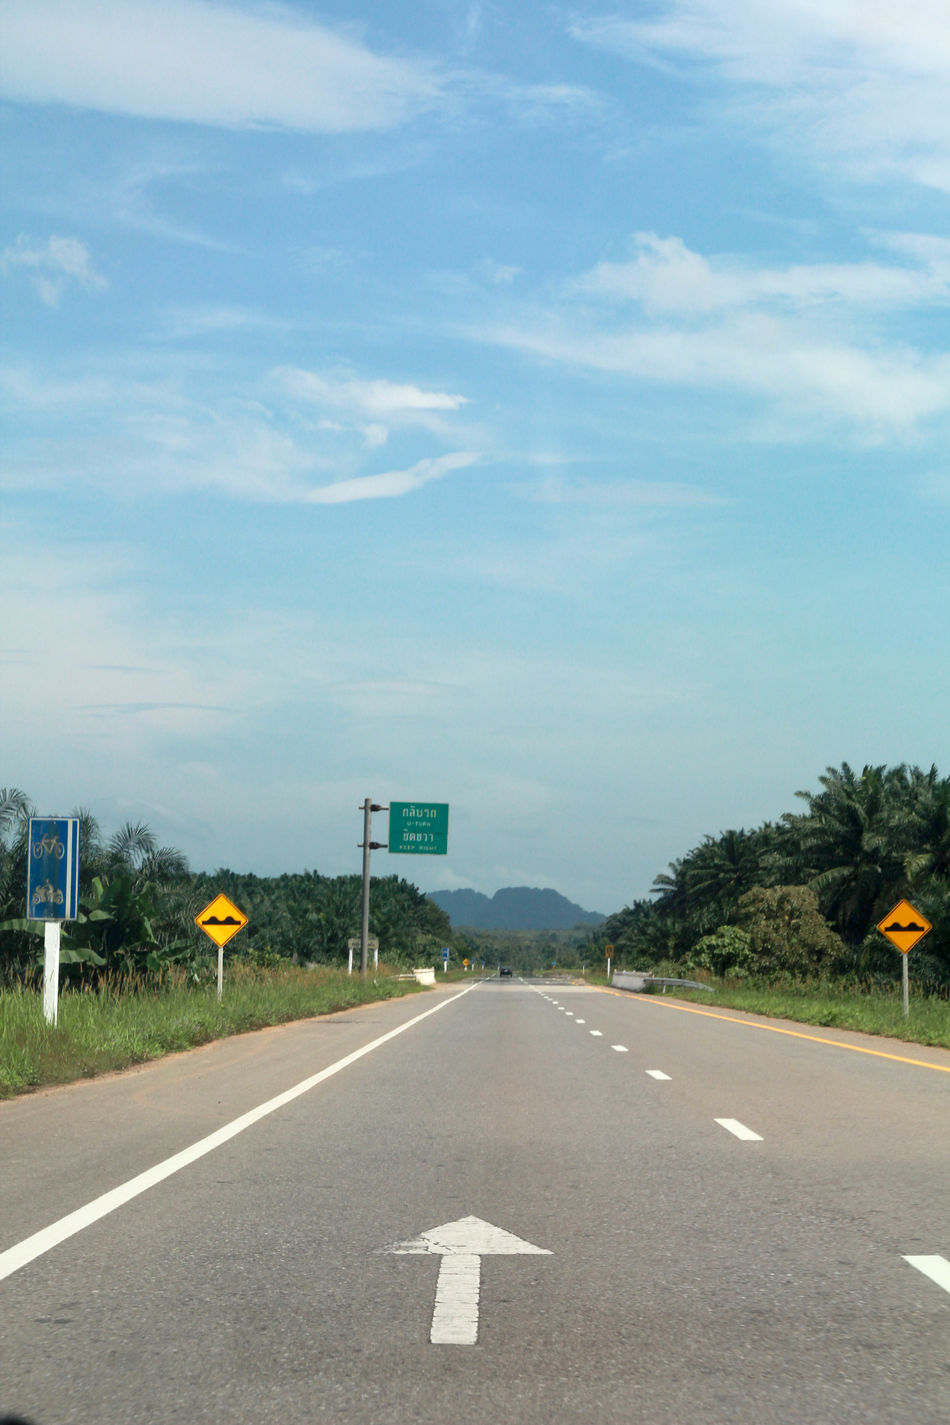 Far Go Go Away Life Road Road Sign The Way Forward Way